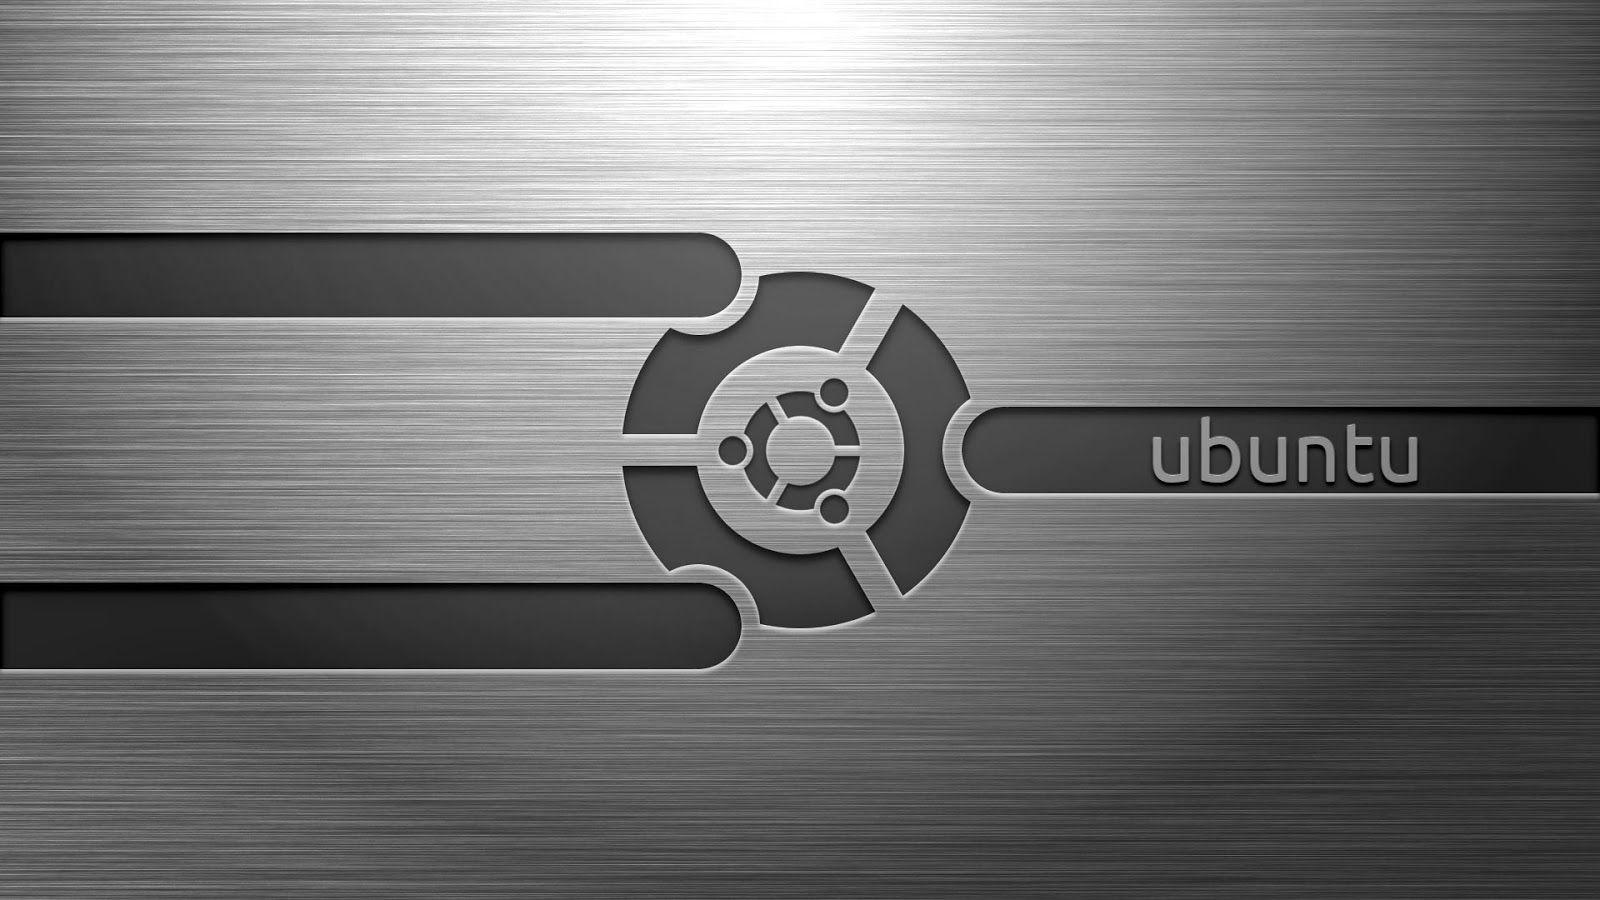 Pin On Wallpaper Linux ubuntu 3d logo hd wallpaper free